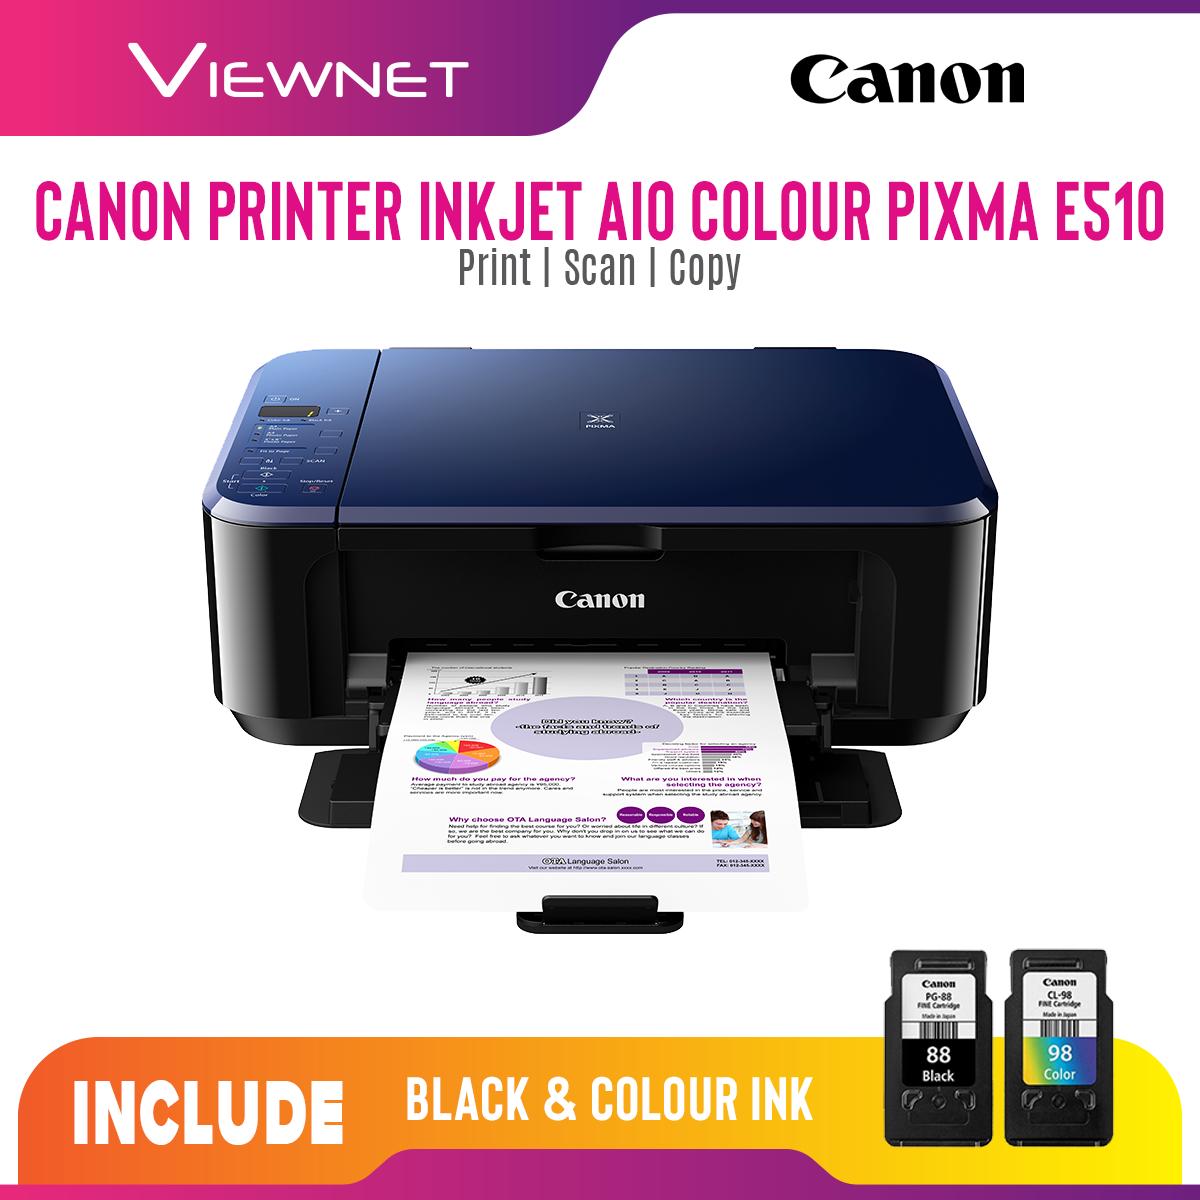 Canon InkJet AIO Colour PIXMA E510 Printer (Print/Scan/Copy)